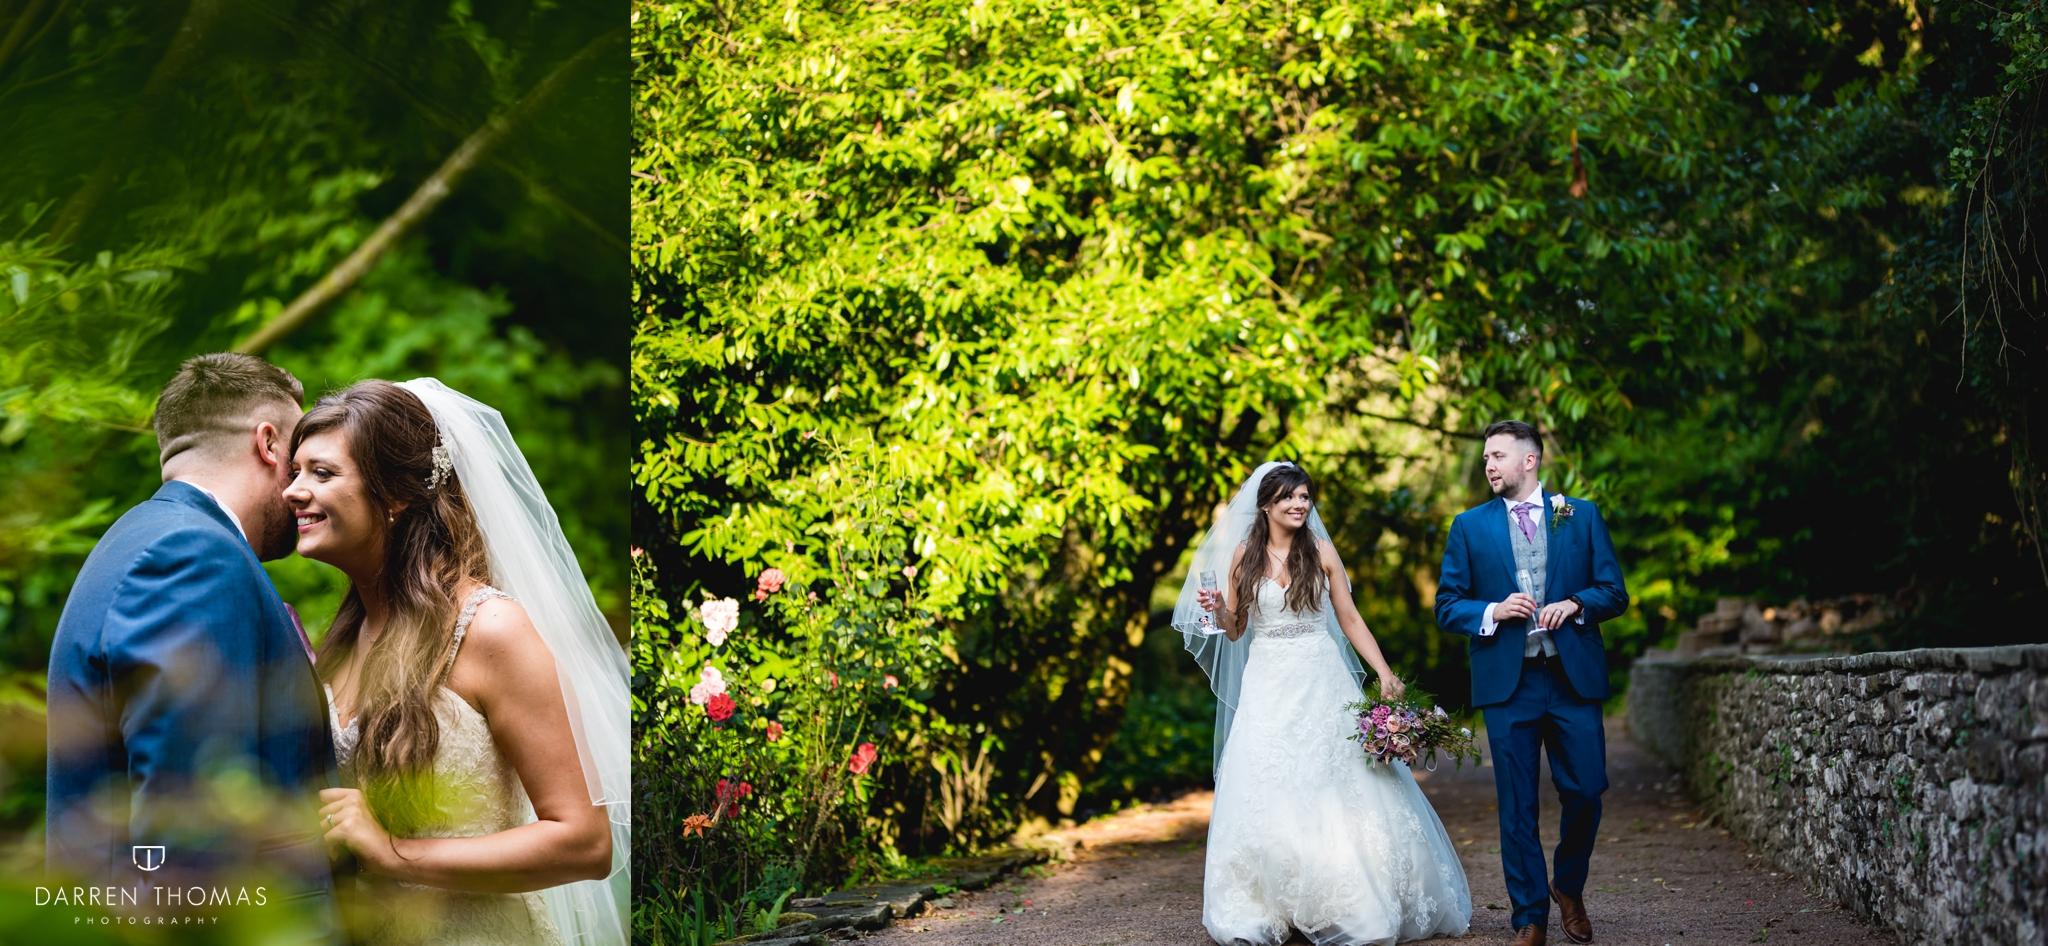 clearwell castle wedding_0012.jpg